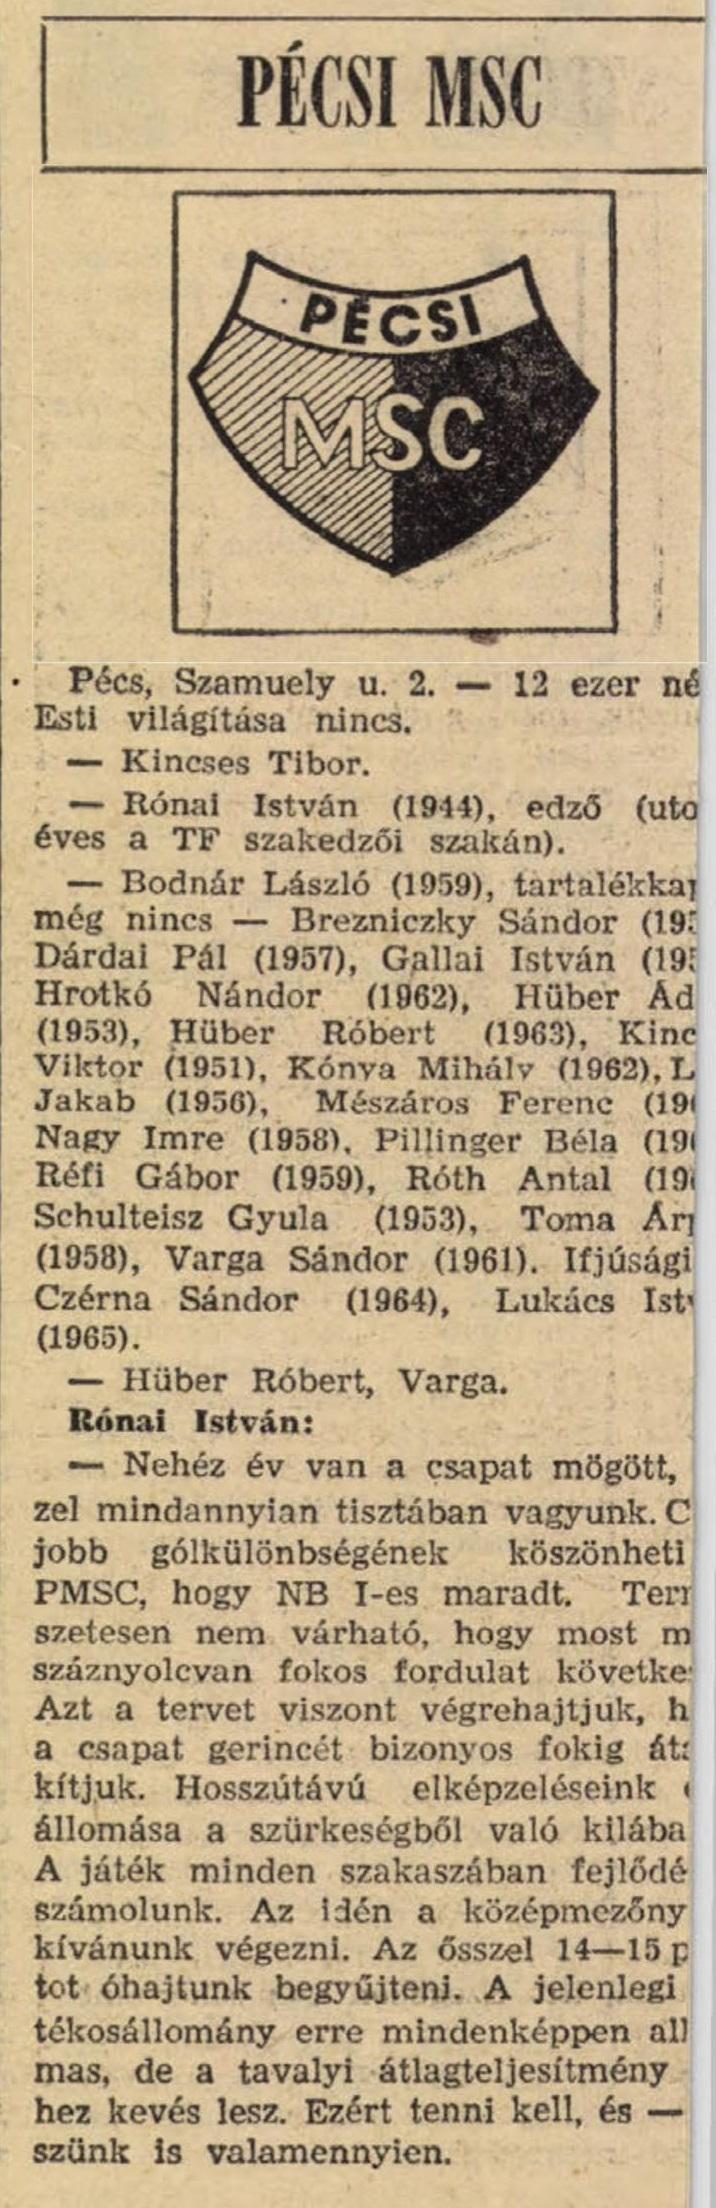 idokapszula_nb_i_1983_84_bevezetes_i_pecsi_msc.jpg